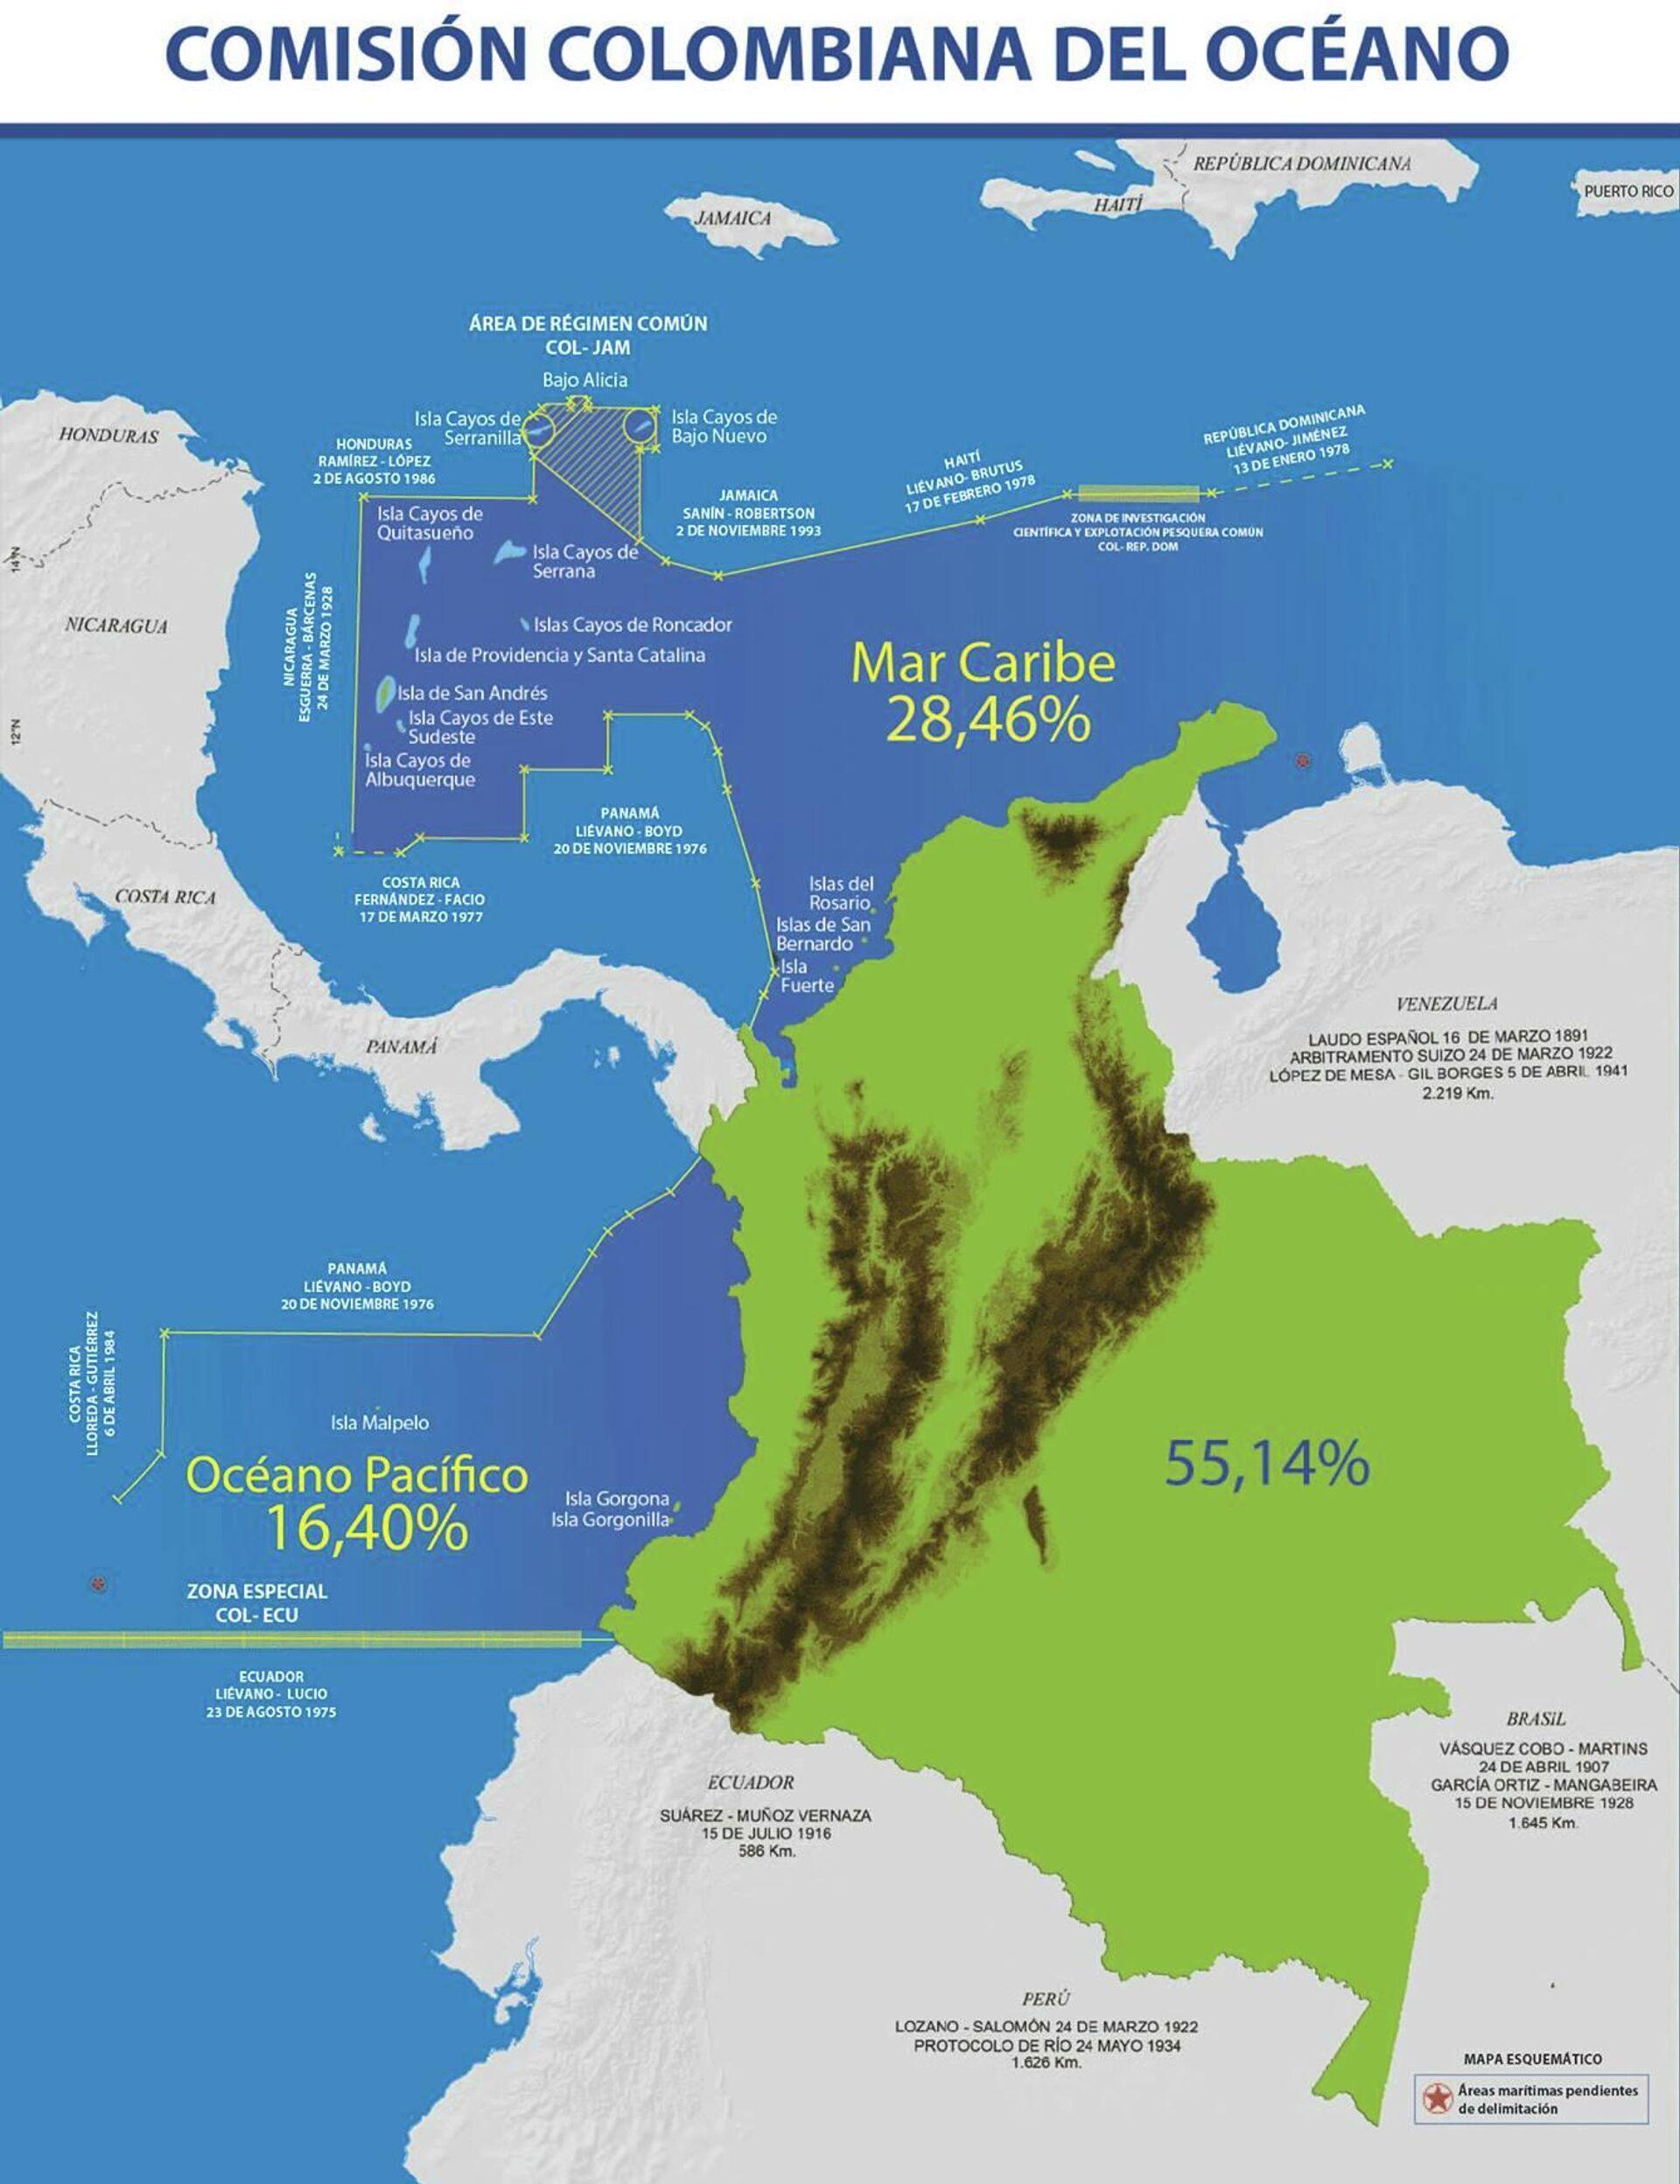 Aguas territoriales de Colombia - Sputnik Mundo, 1920, 14.09.2021